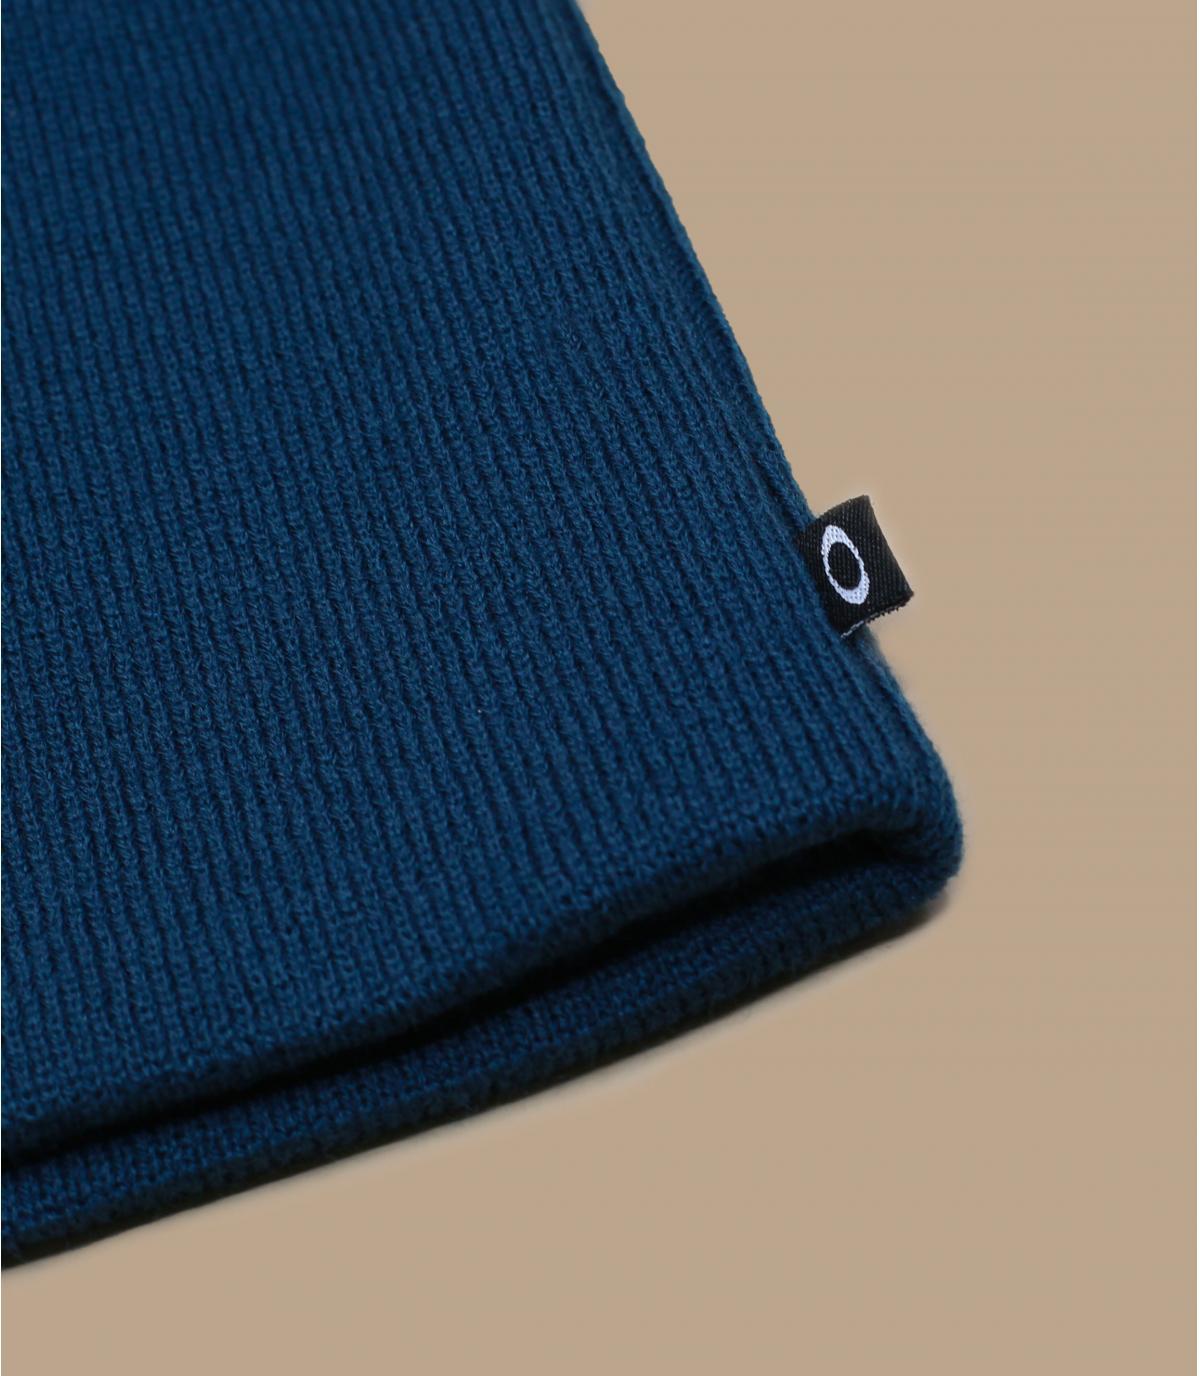 Details Fine Knit Beanie pond blue - afbeeling 2